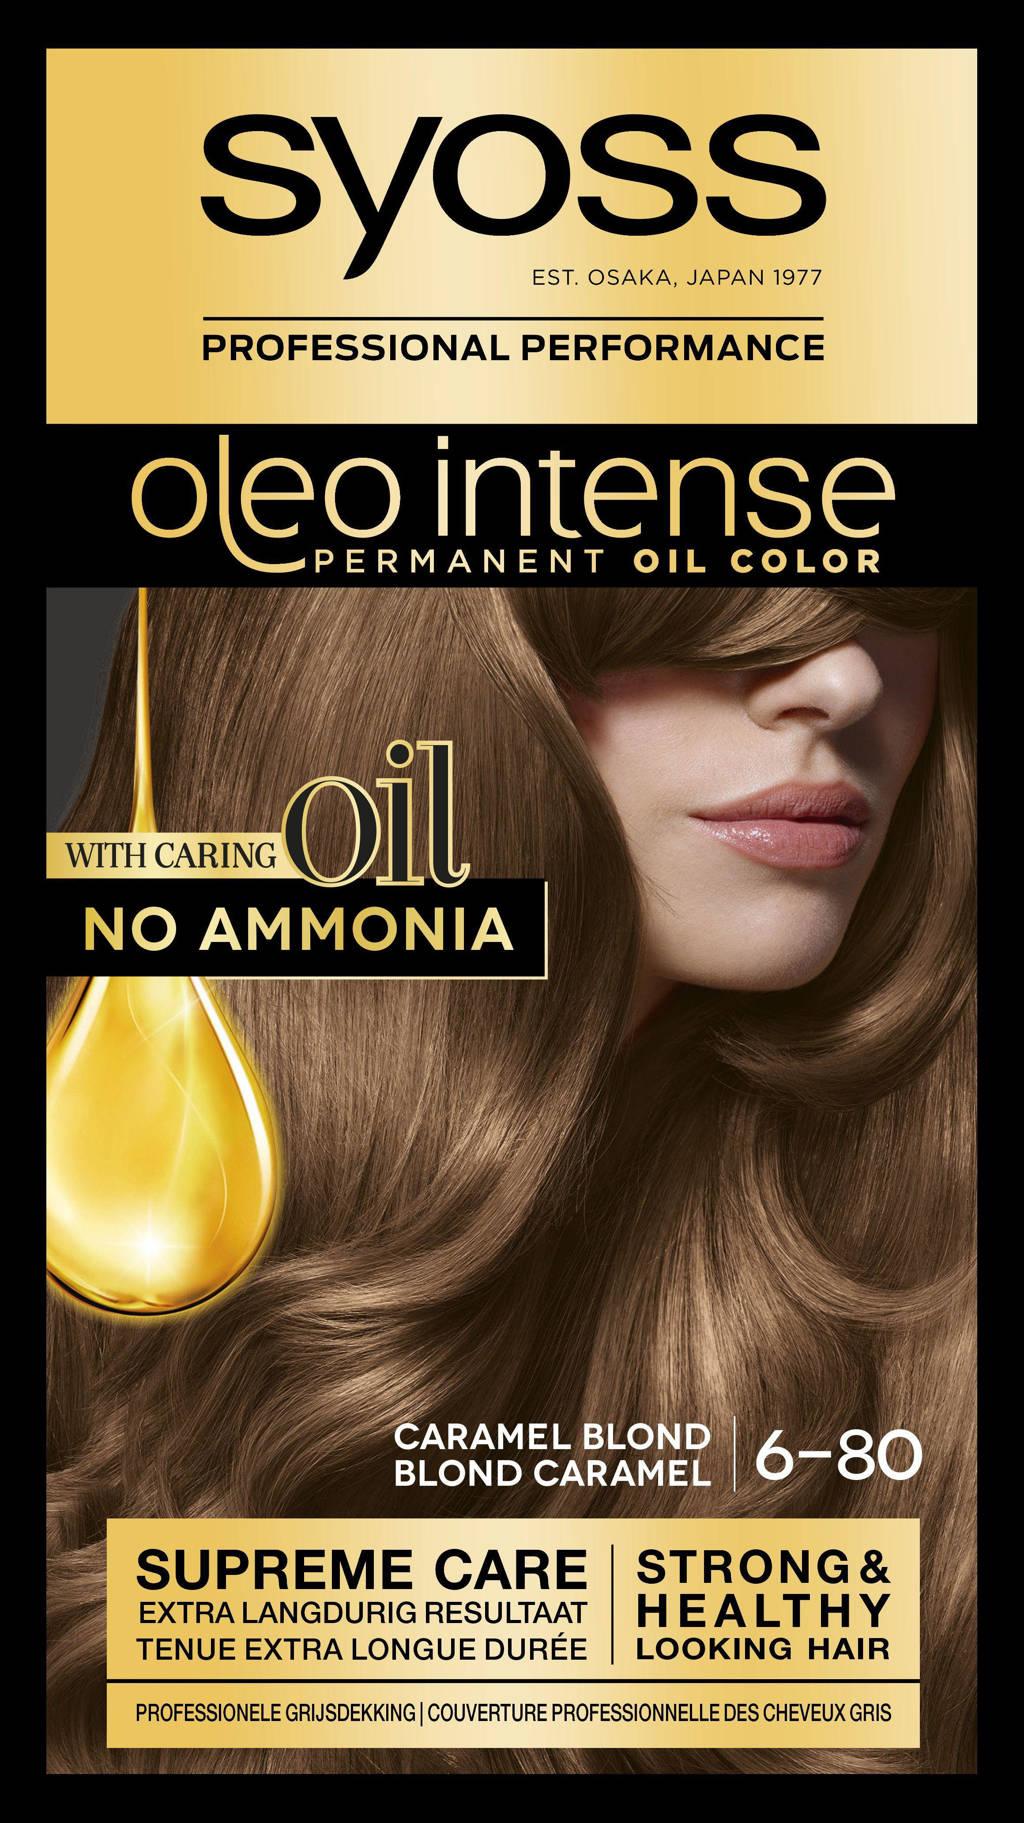 Syoss Oleo Intense 6-80 Caramel Blond, 6-80 caramel blond